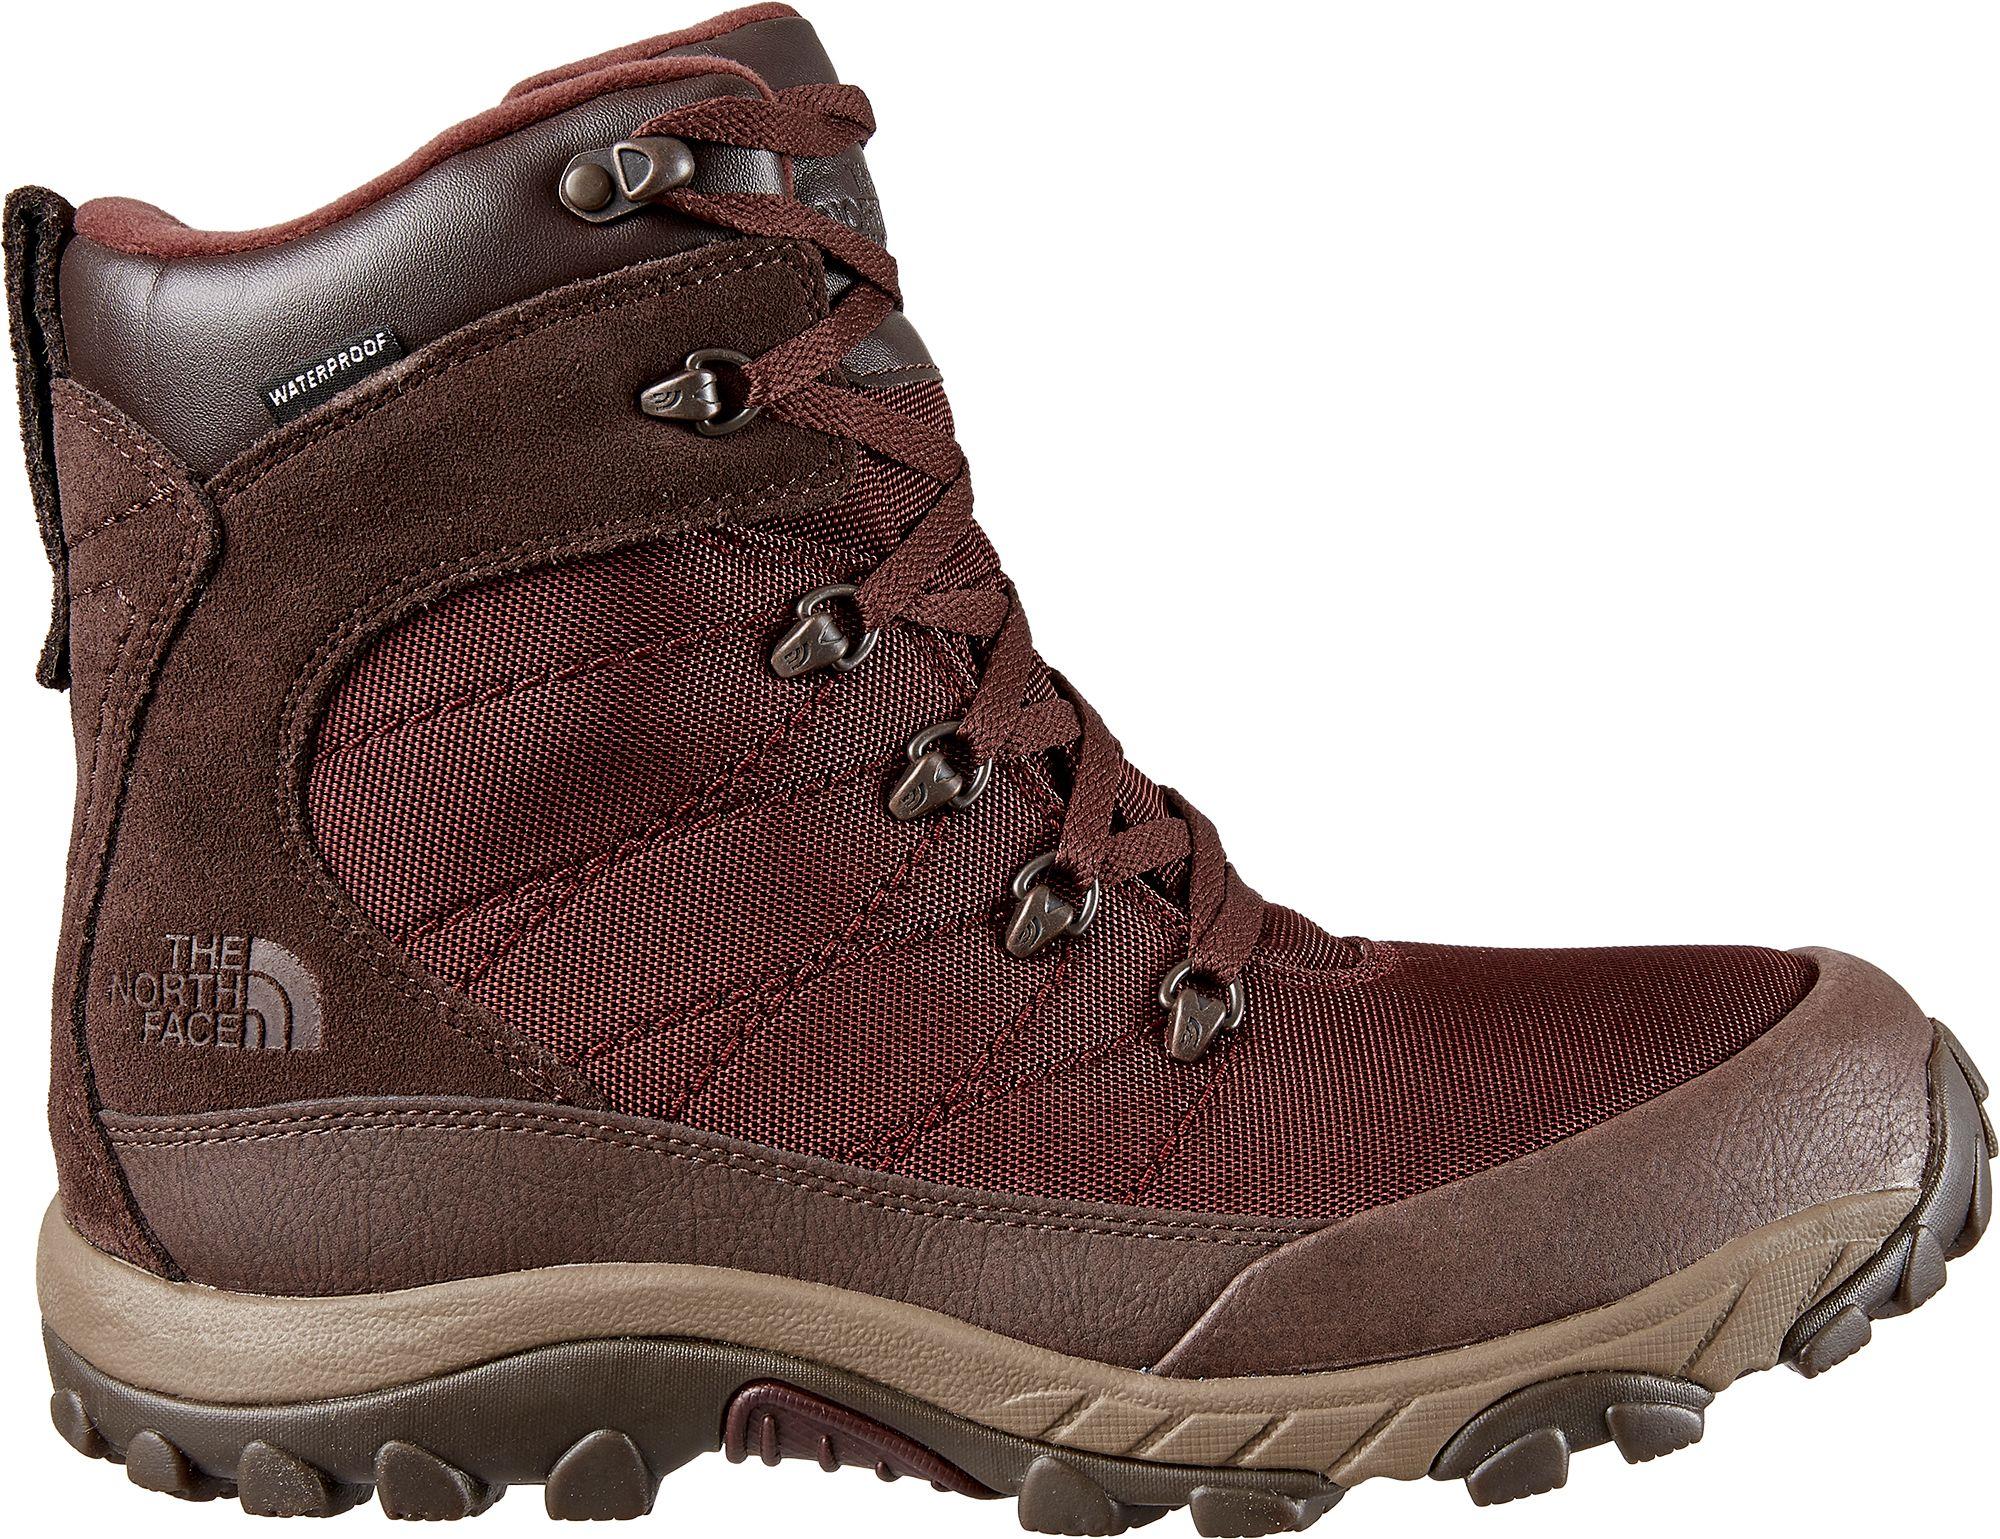 8d73d9b8a The North Face Men's Chilkat Nylon Waterproof Winter Boots | DICK'S ...